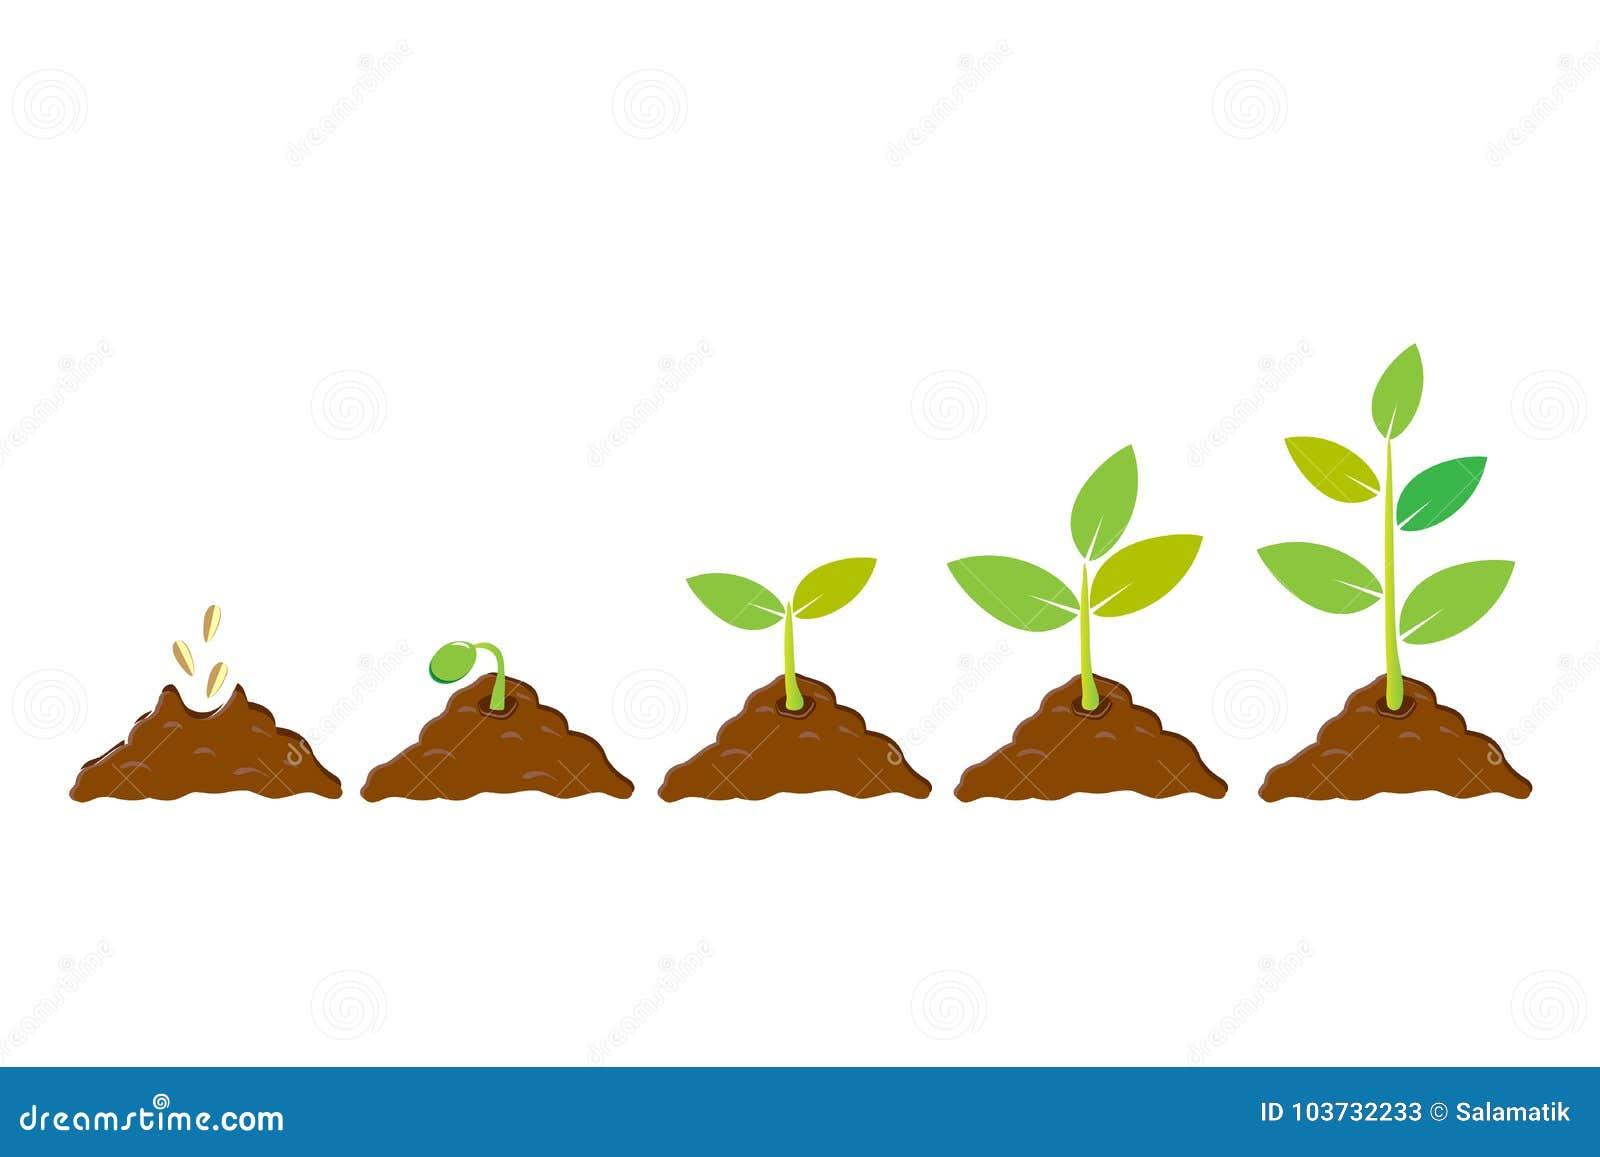 grow cartoons  illustrations  u0026 vector stock images